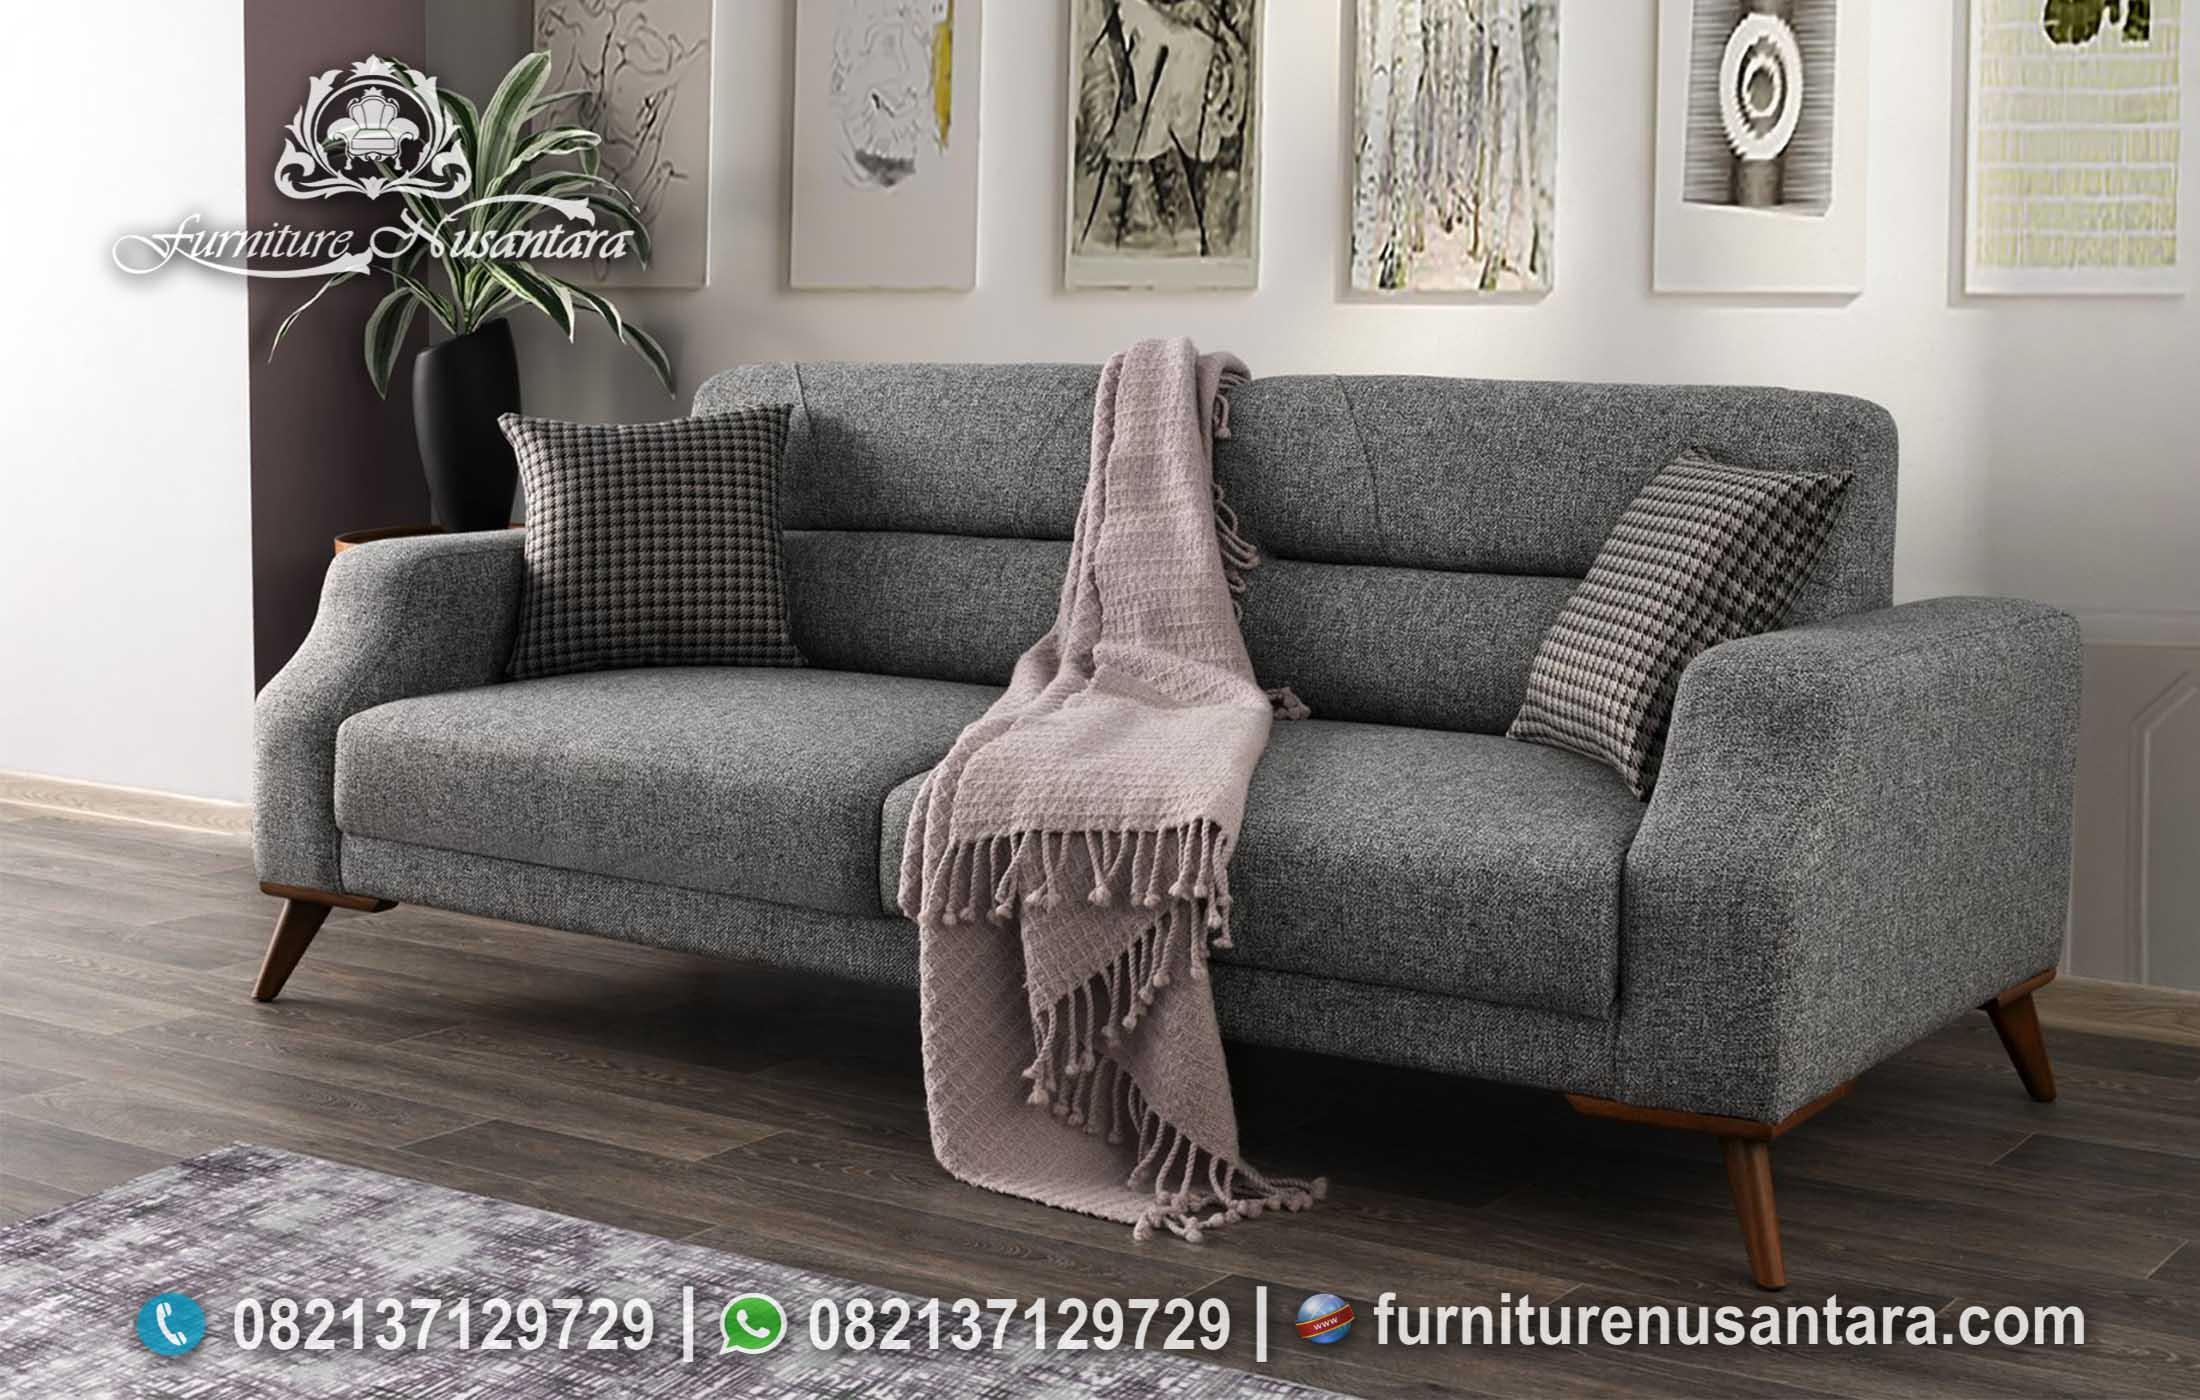 Sofa Santai 2 Dudukan Abu Abu ST-111, Furniture Nusantara